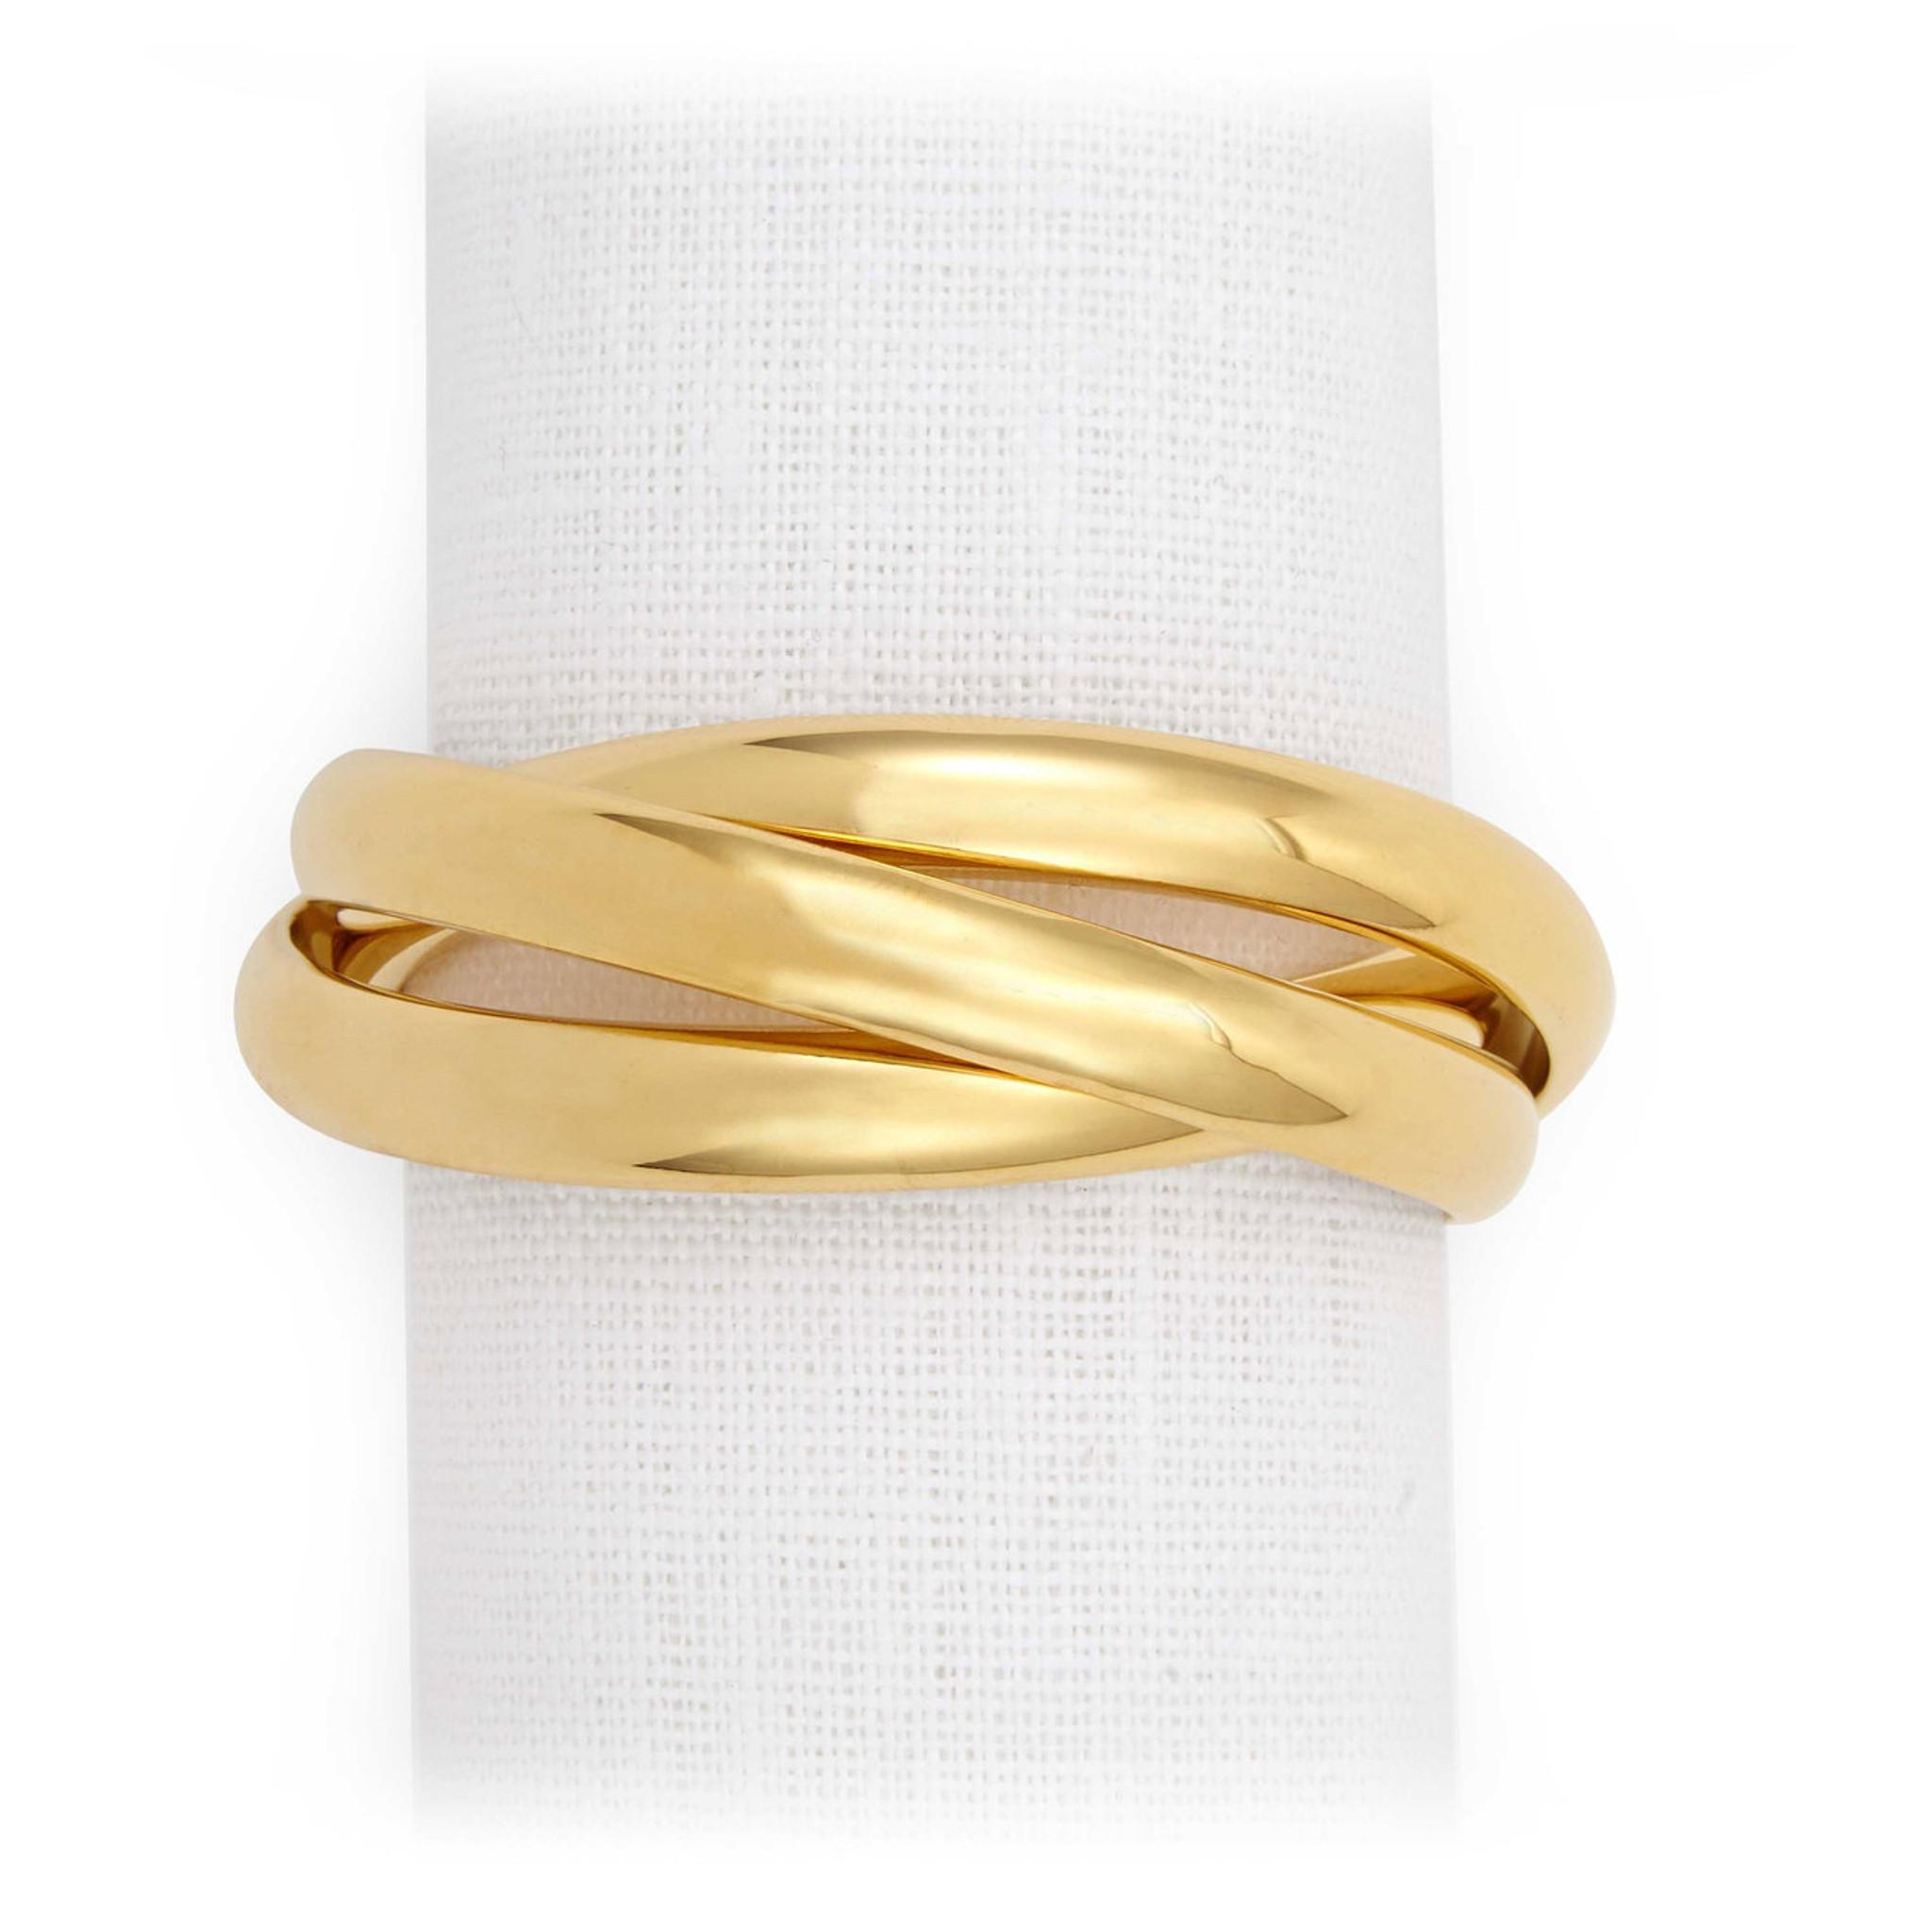 L Objet Three Ring Napkin Rings Gold Napkin Rings Nj1002 Homebello